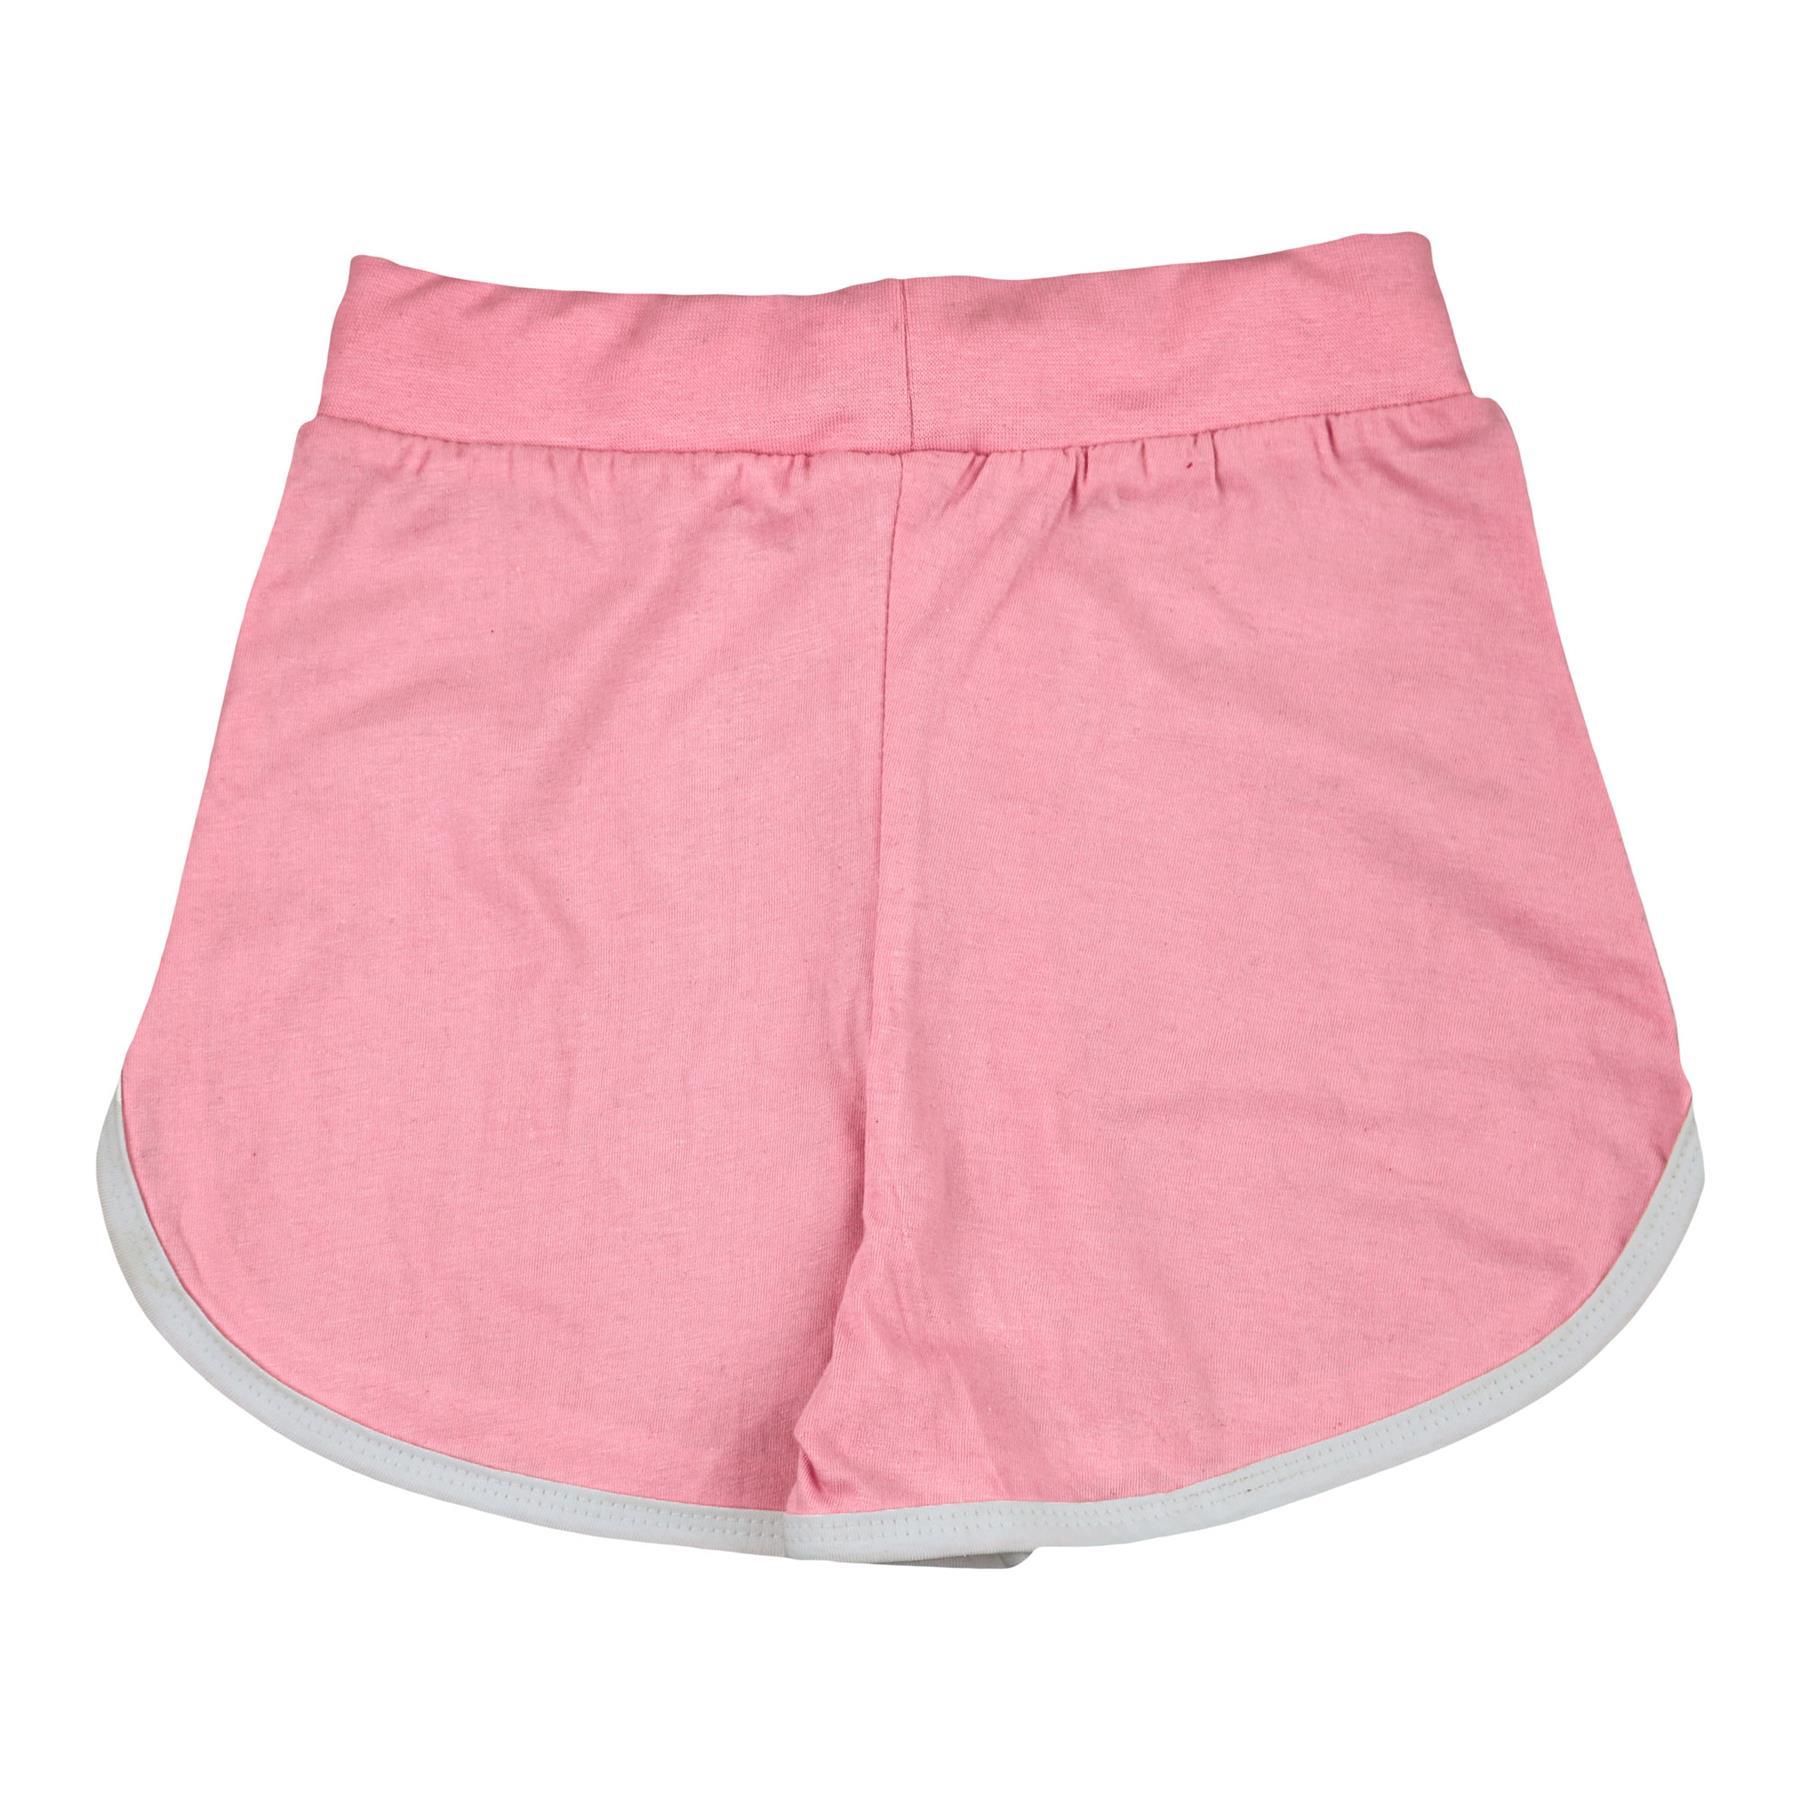 Kids-Girls-Shorts-100-Cotton-Dance-Gym-Sports-Summer-Hot-Short-Pants-2-13-Years Indexbild 3